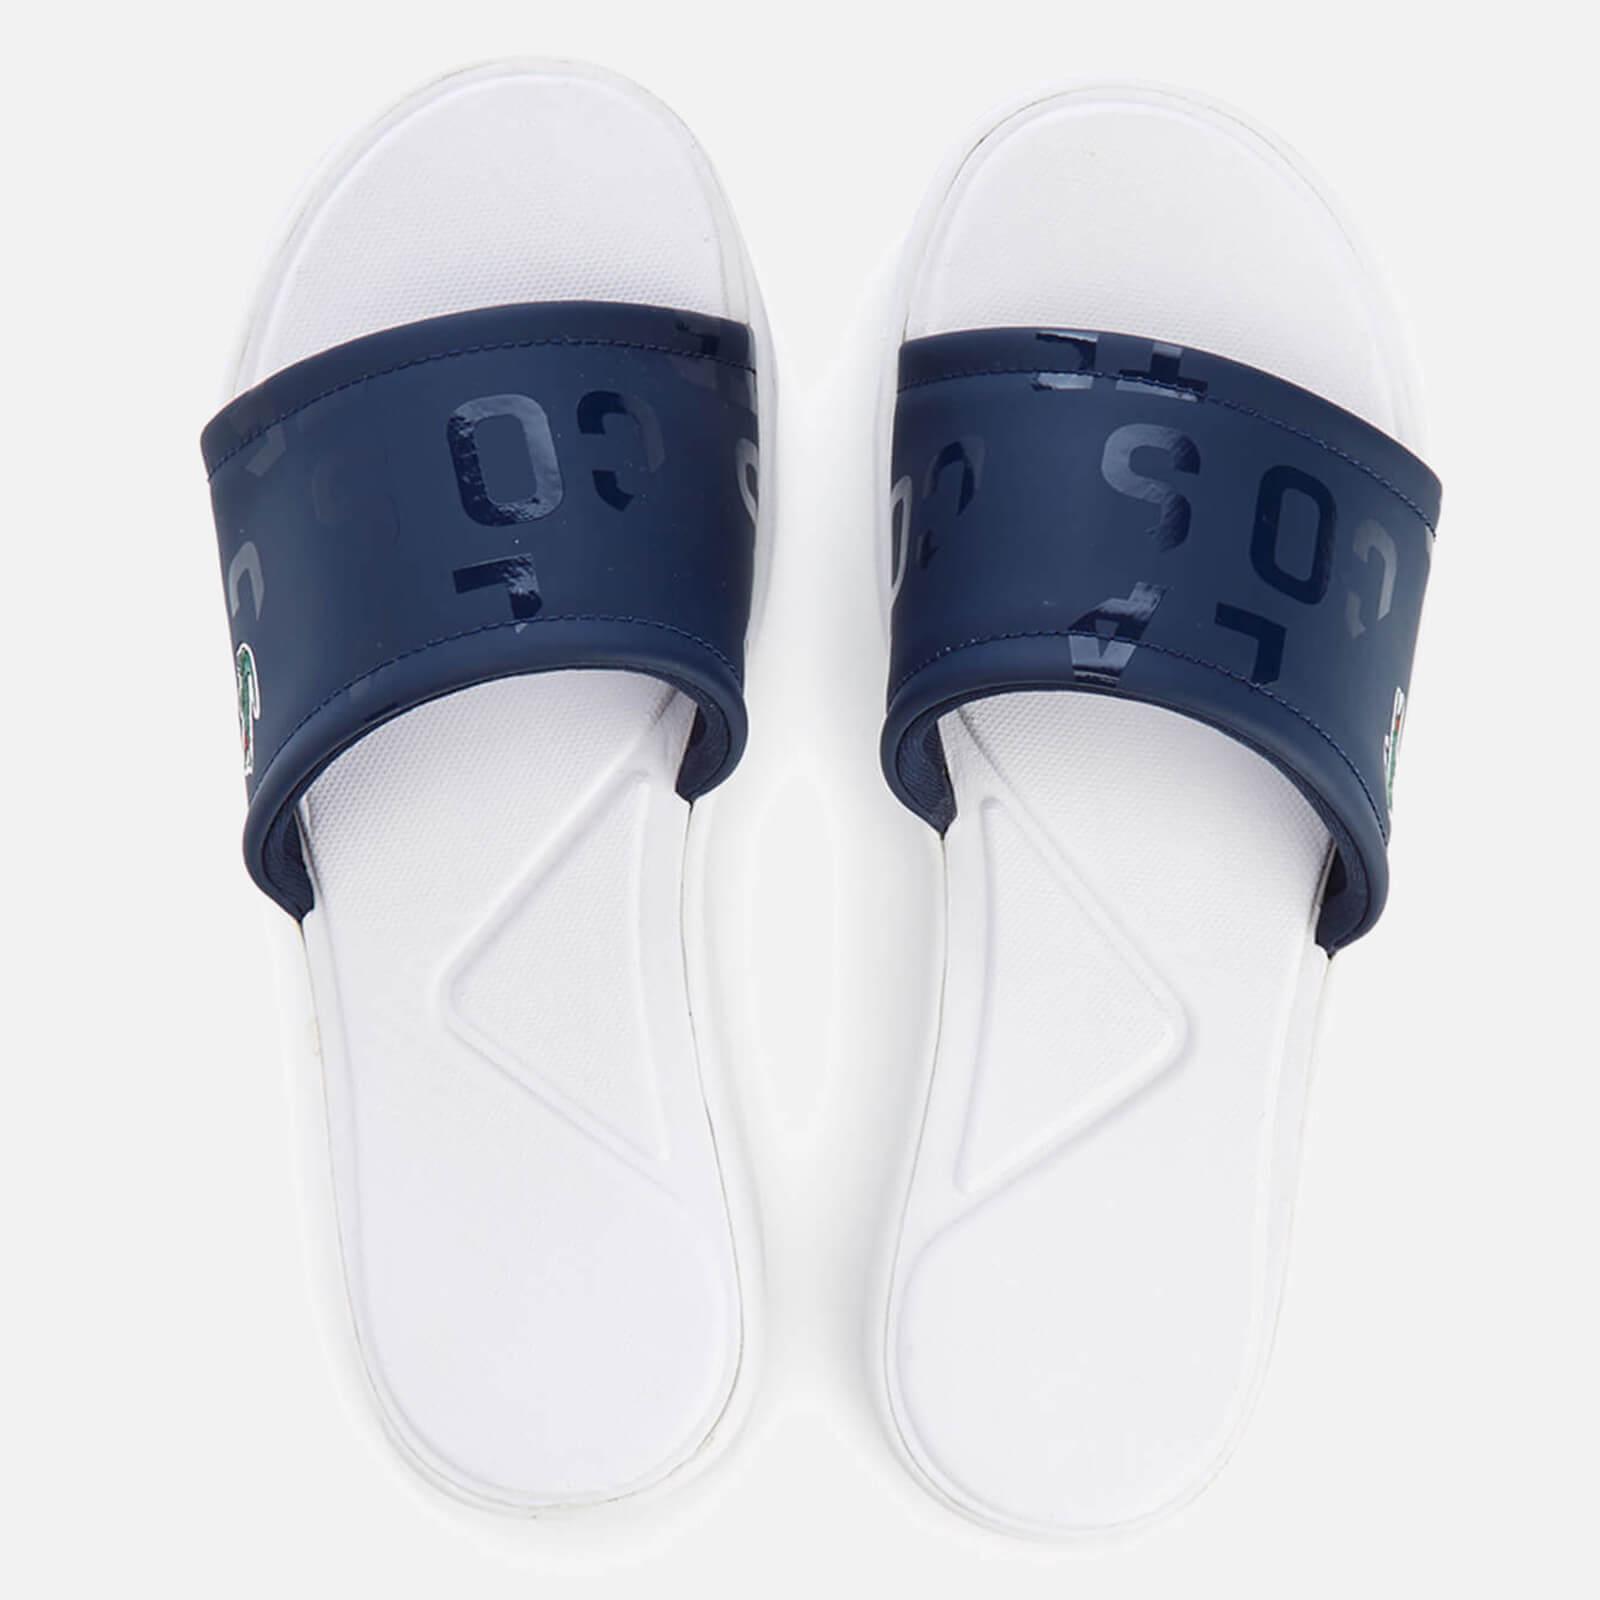 e90d60d20ca3e Lacoste Women s L.30 Slide 117 1 Slide Sandals - Navy - Free UK Delivery  over £50